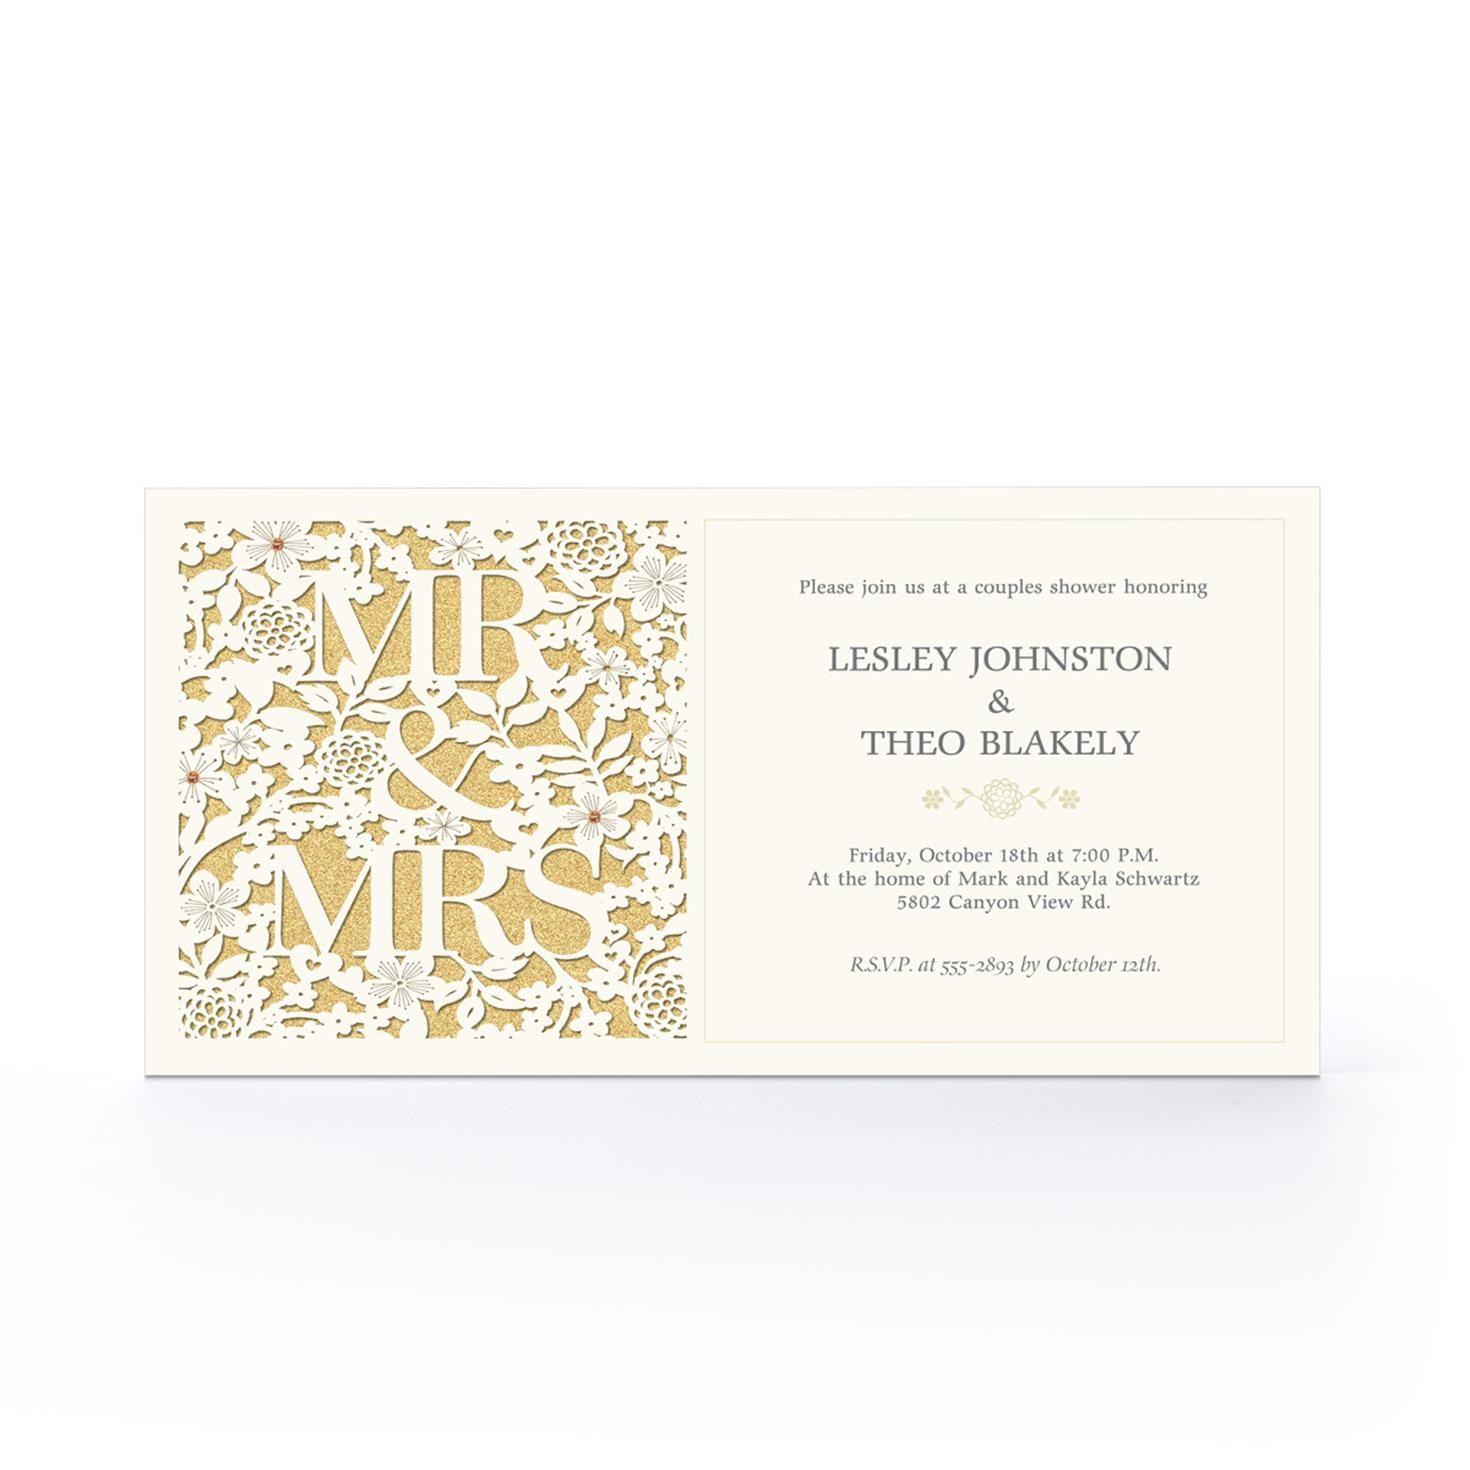 Elegant mr mrs large wedding ideas pinterest wedding elegant mr mrs large monicamarmolfo Image collections